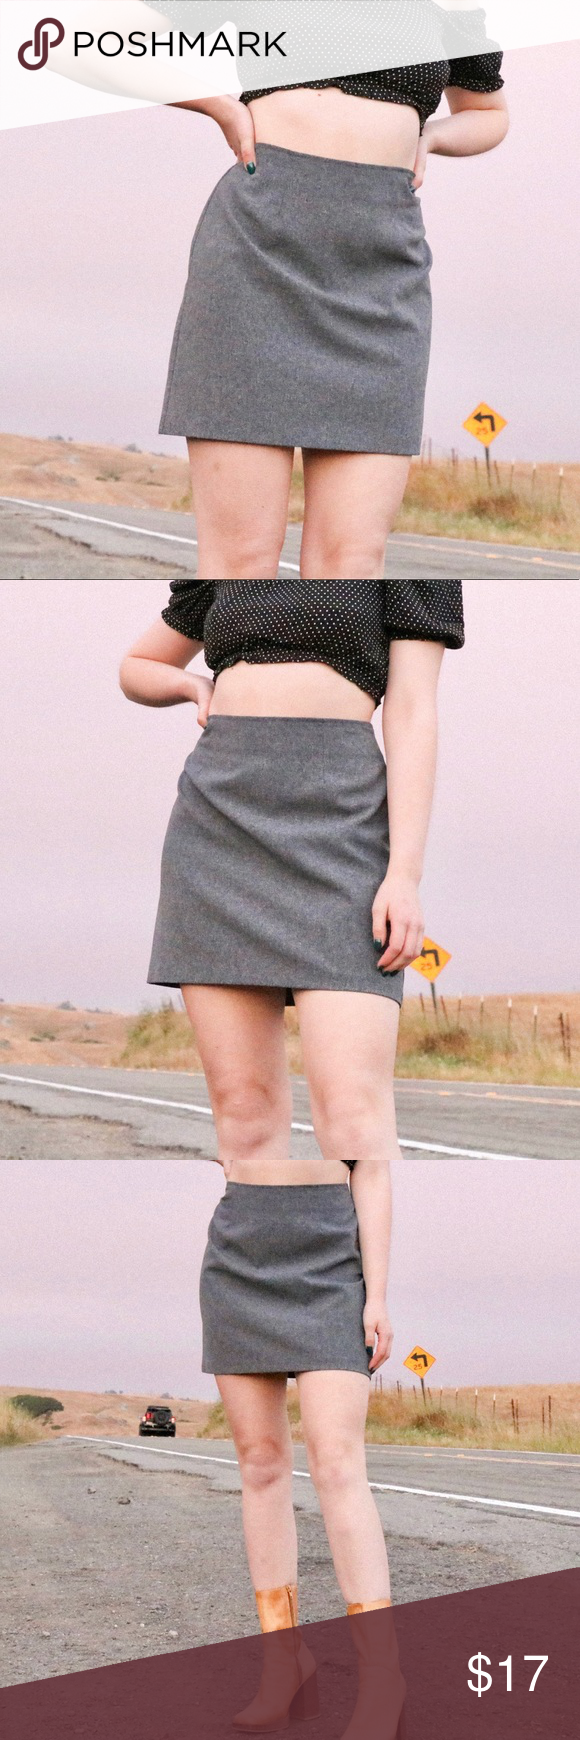 e4cfe22f Sold on depop | ⚡️My Depop⚡ | Fashion, Skirts, Mini skirts